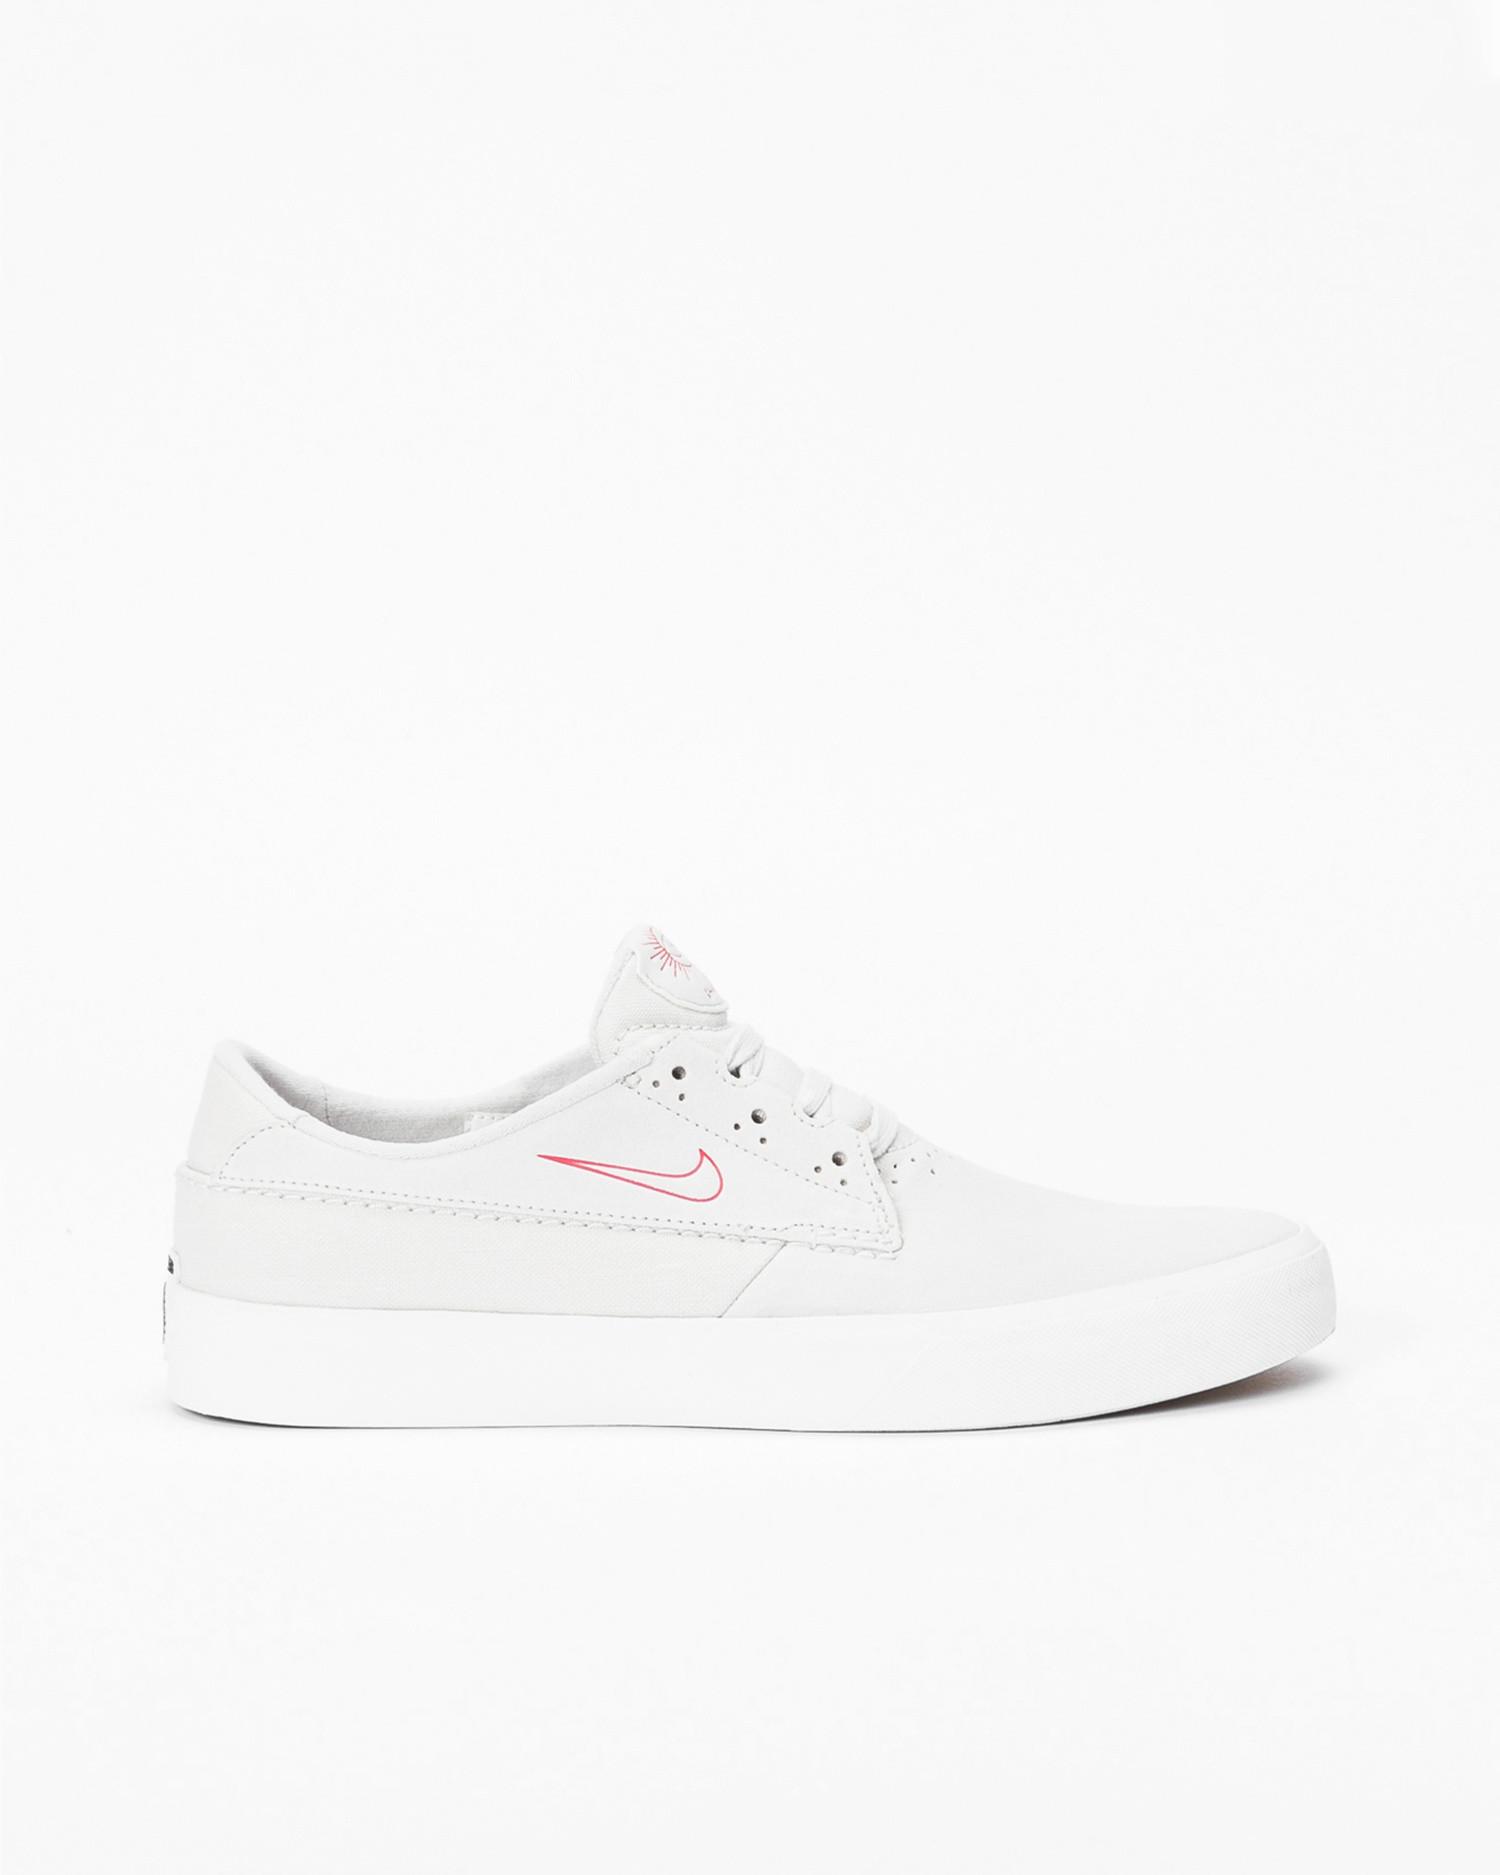 Nike SB Shane Summit white/University red-white